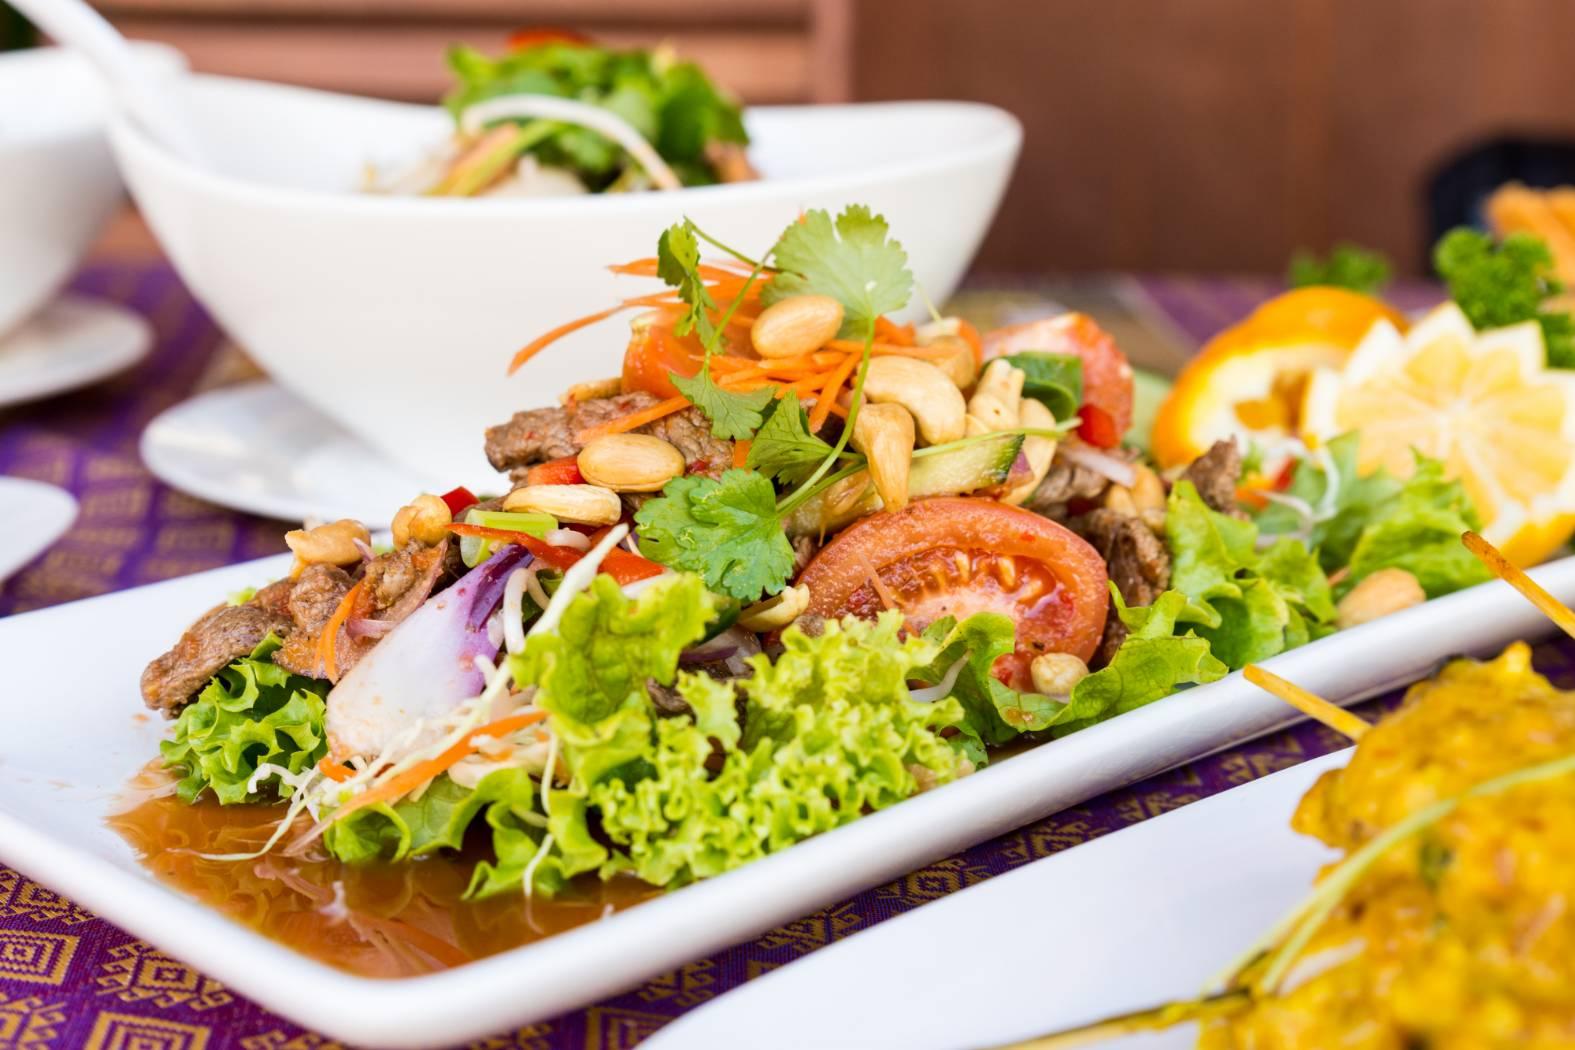 Thai%20thani%20restaurant%20tauranga%20%2814%29_1575x1050